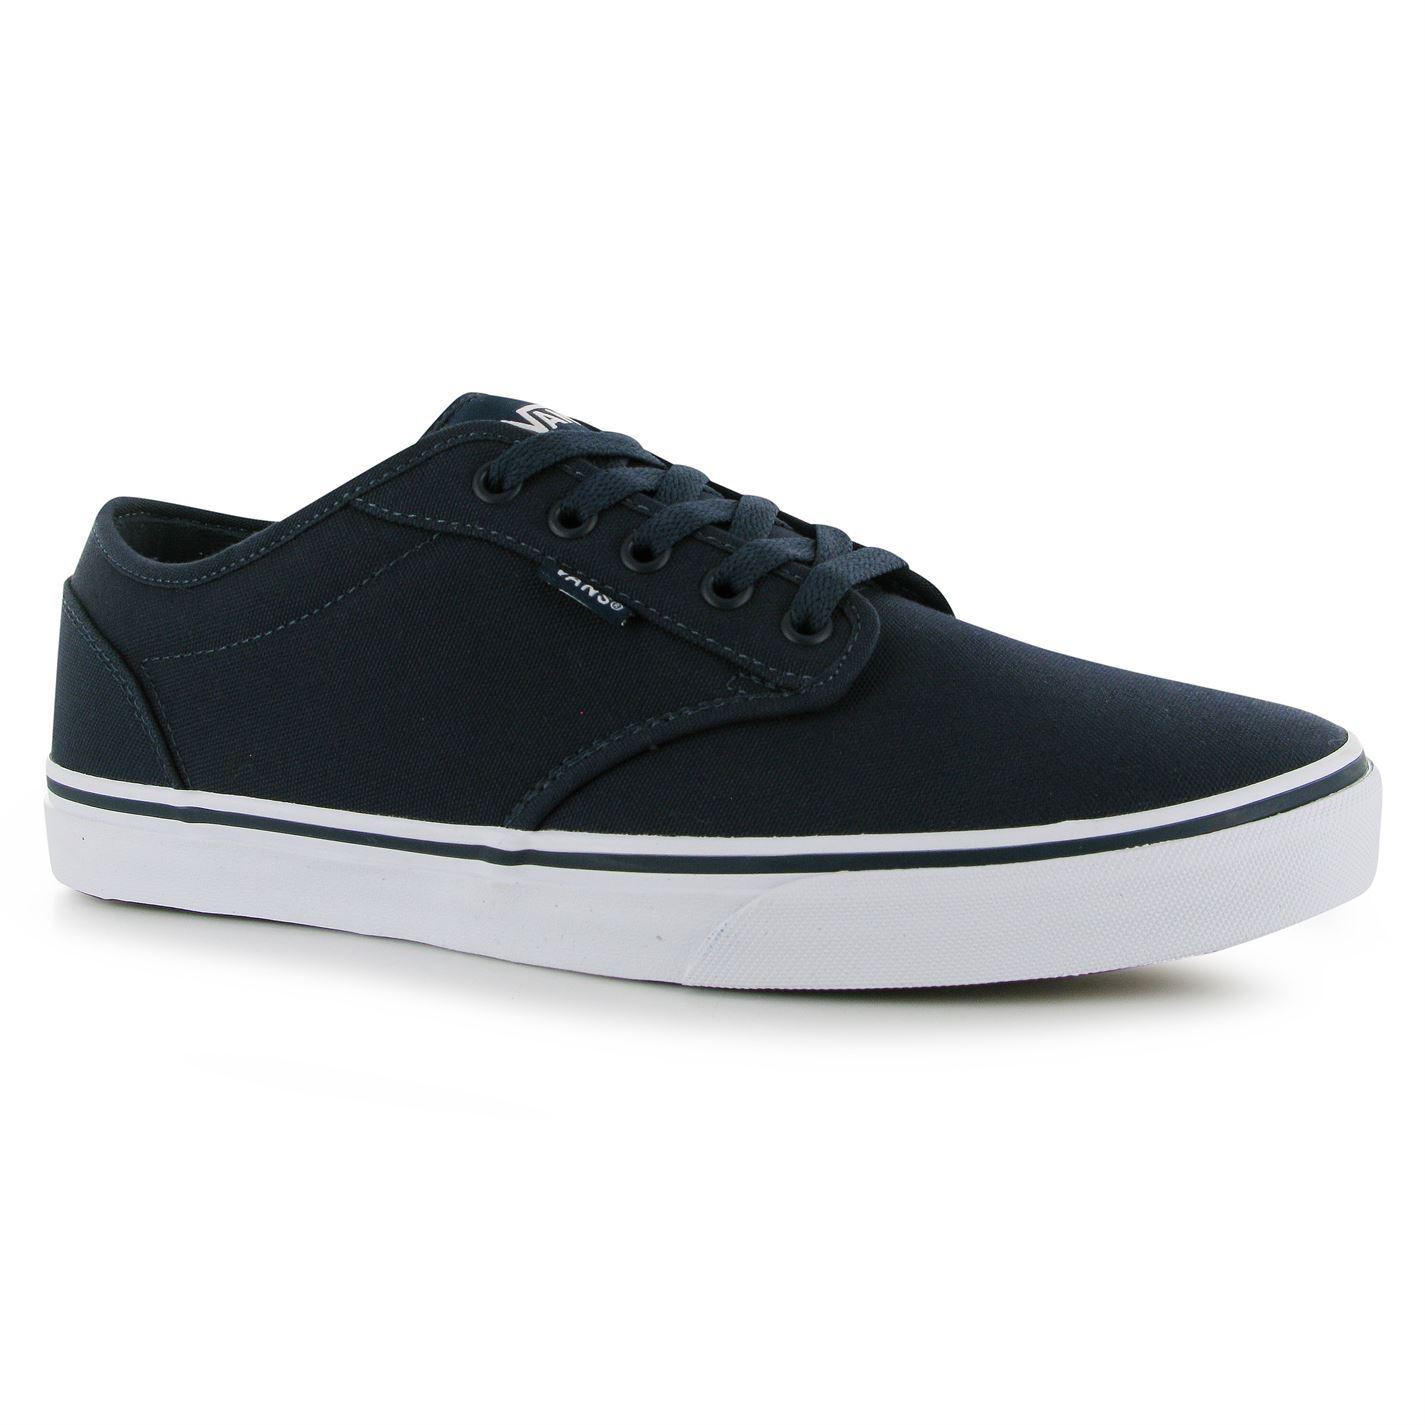 VANS Atwood Canvas Shoes Plimsoles Lace up Gents Mens Navy white UK ... 505535f05a73